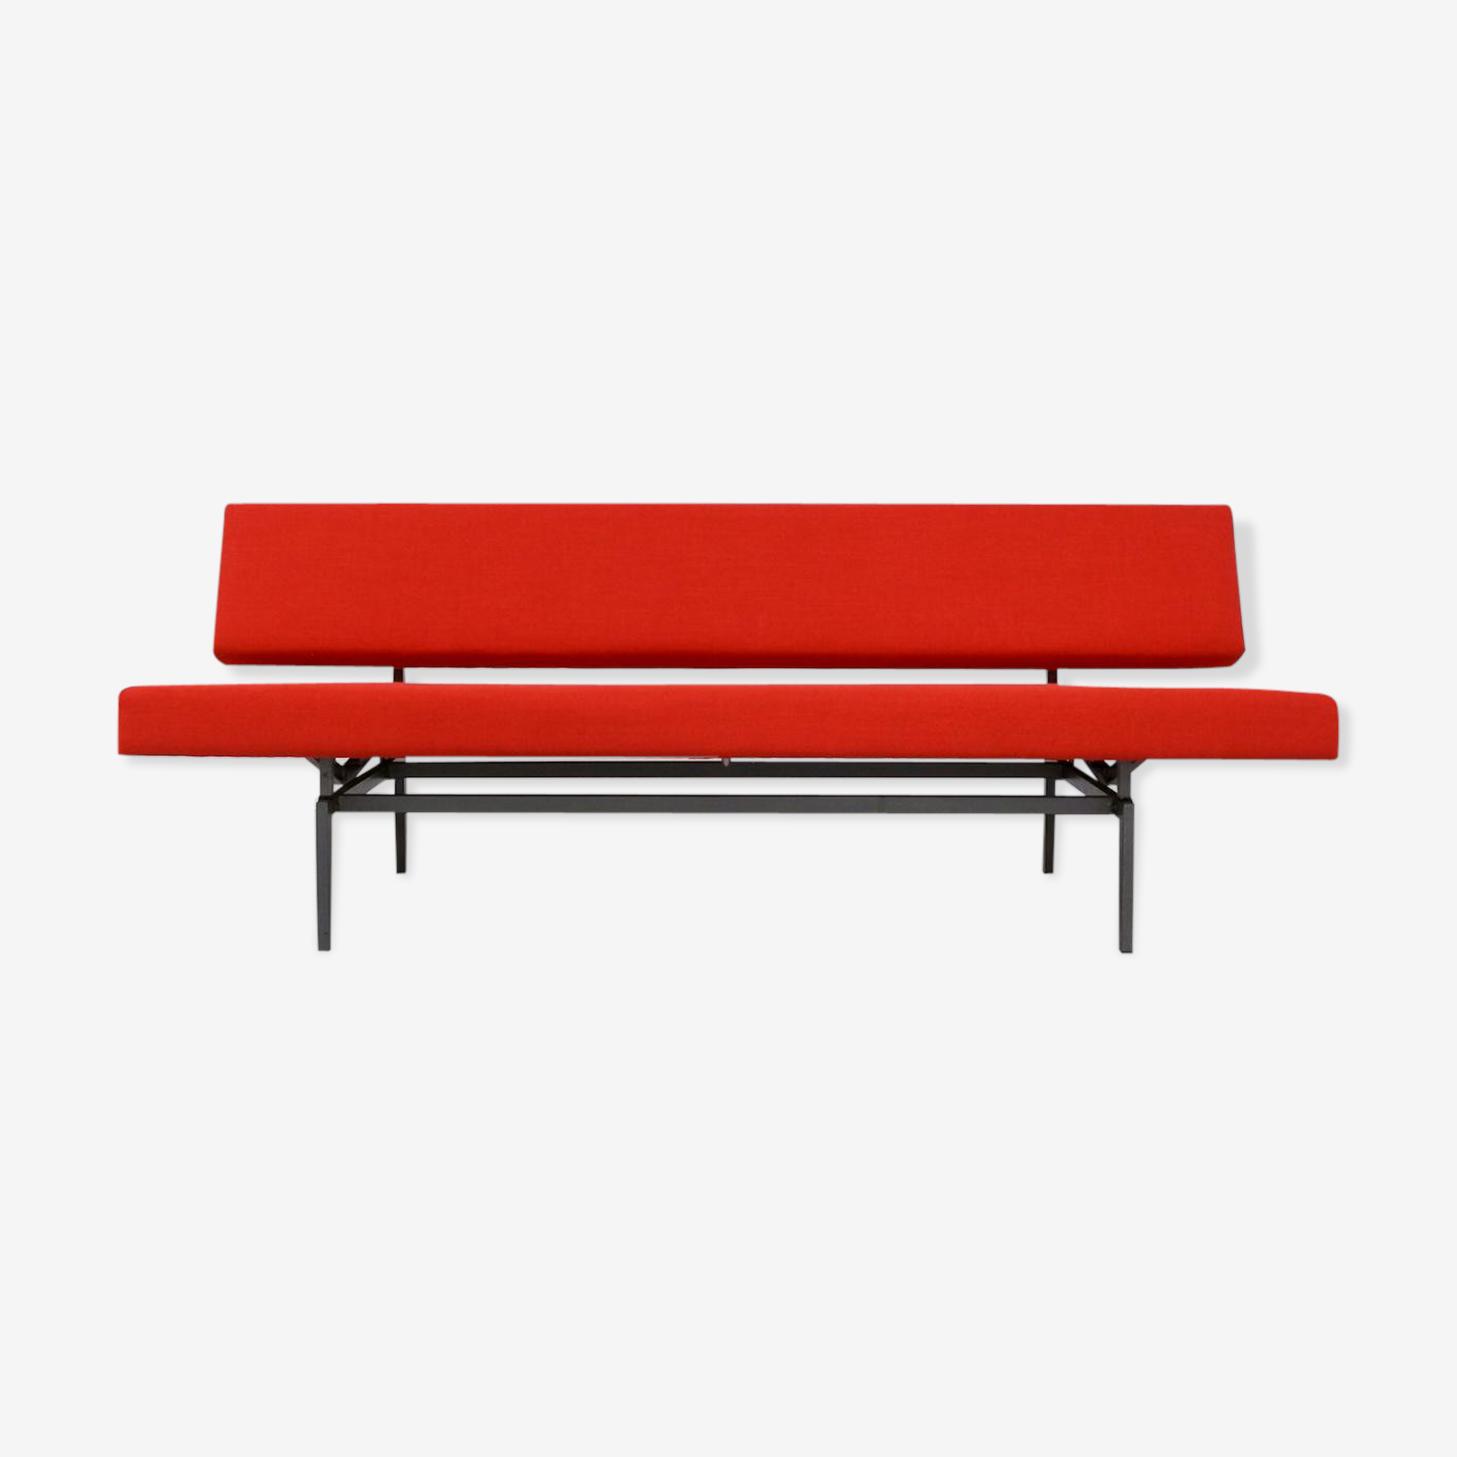 Sofa by Rob Parry for Gelderland Netherlands 1960 s